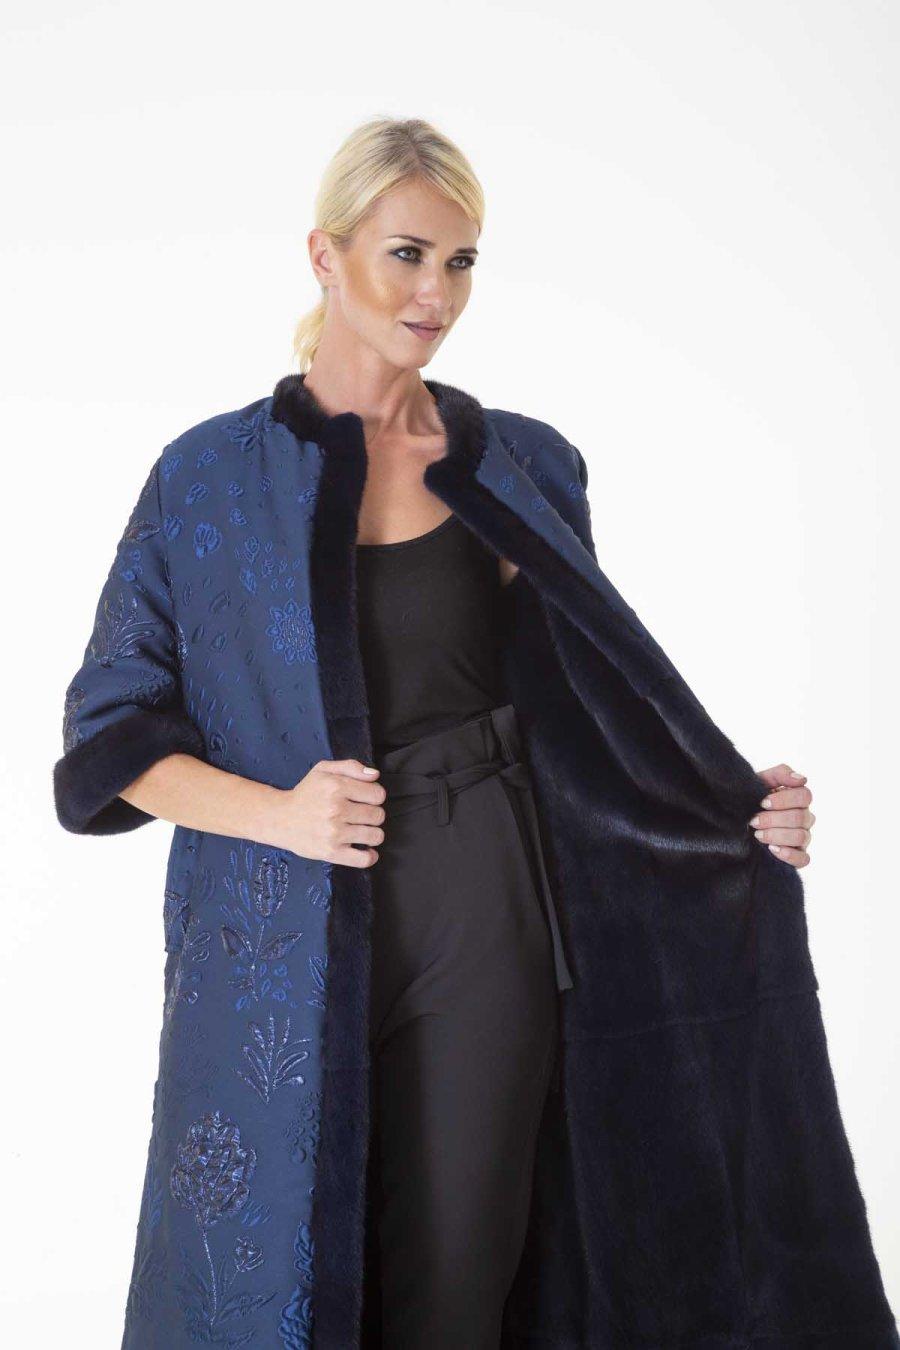 Royal Blue Male Mink and Fabric Coat | Sarigianni Furs